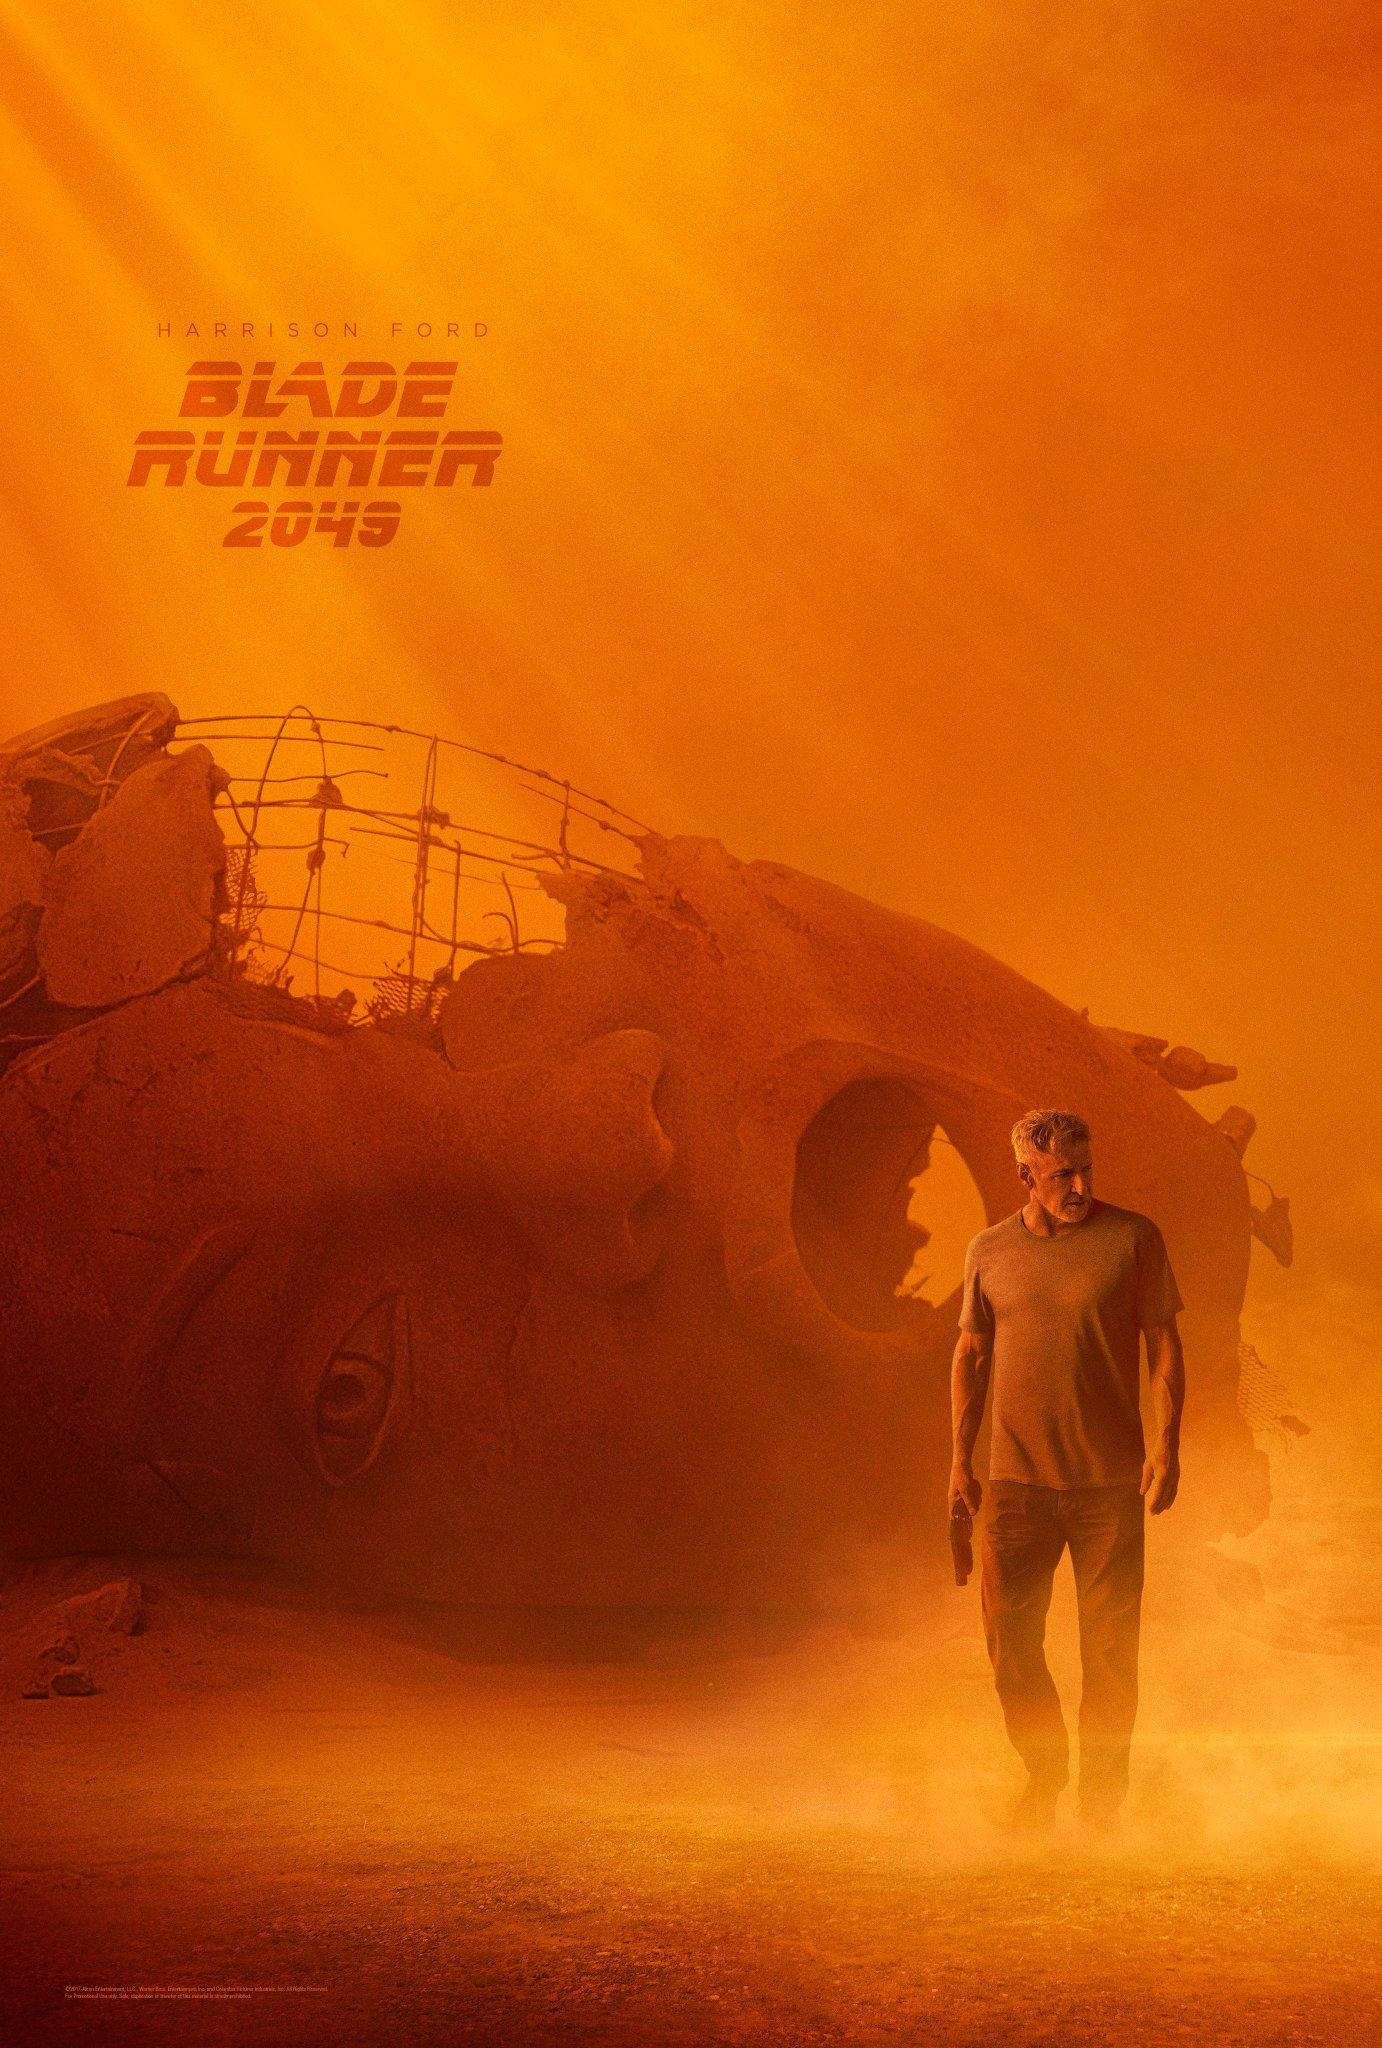 BladeRunner 2049 Harrison Ford